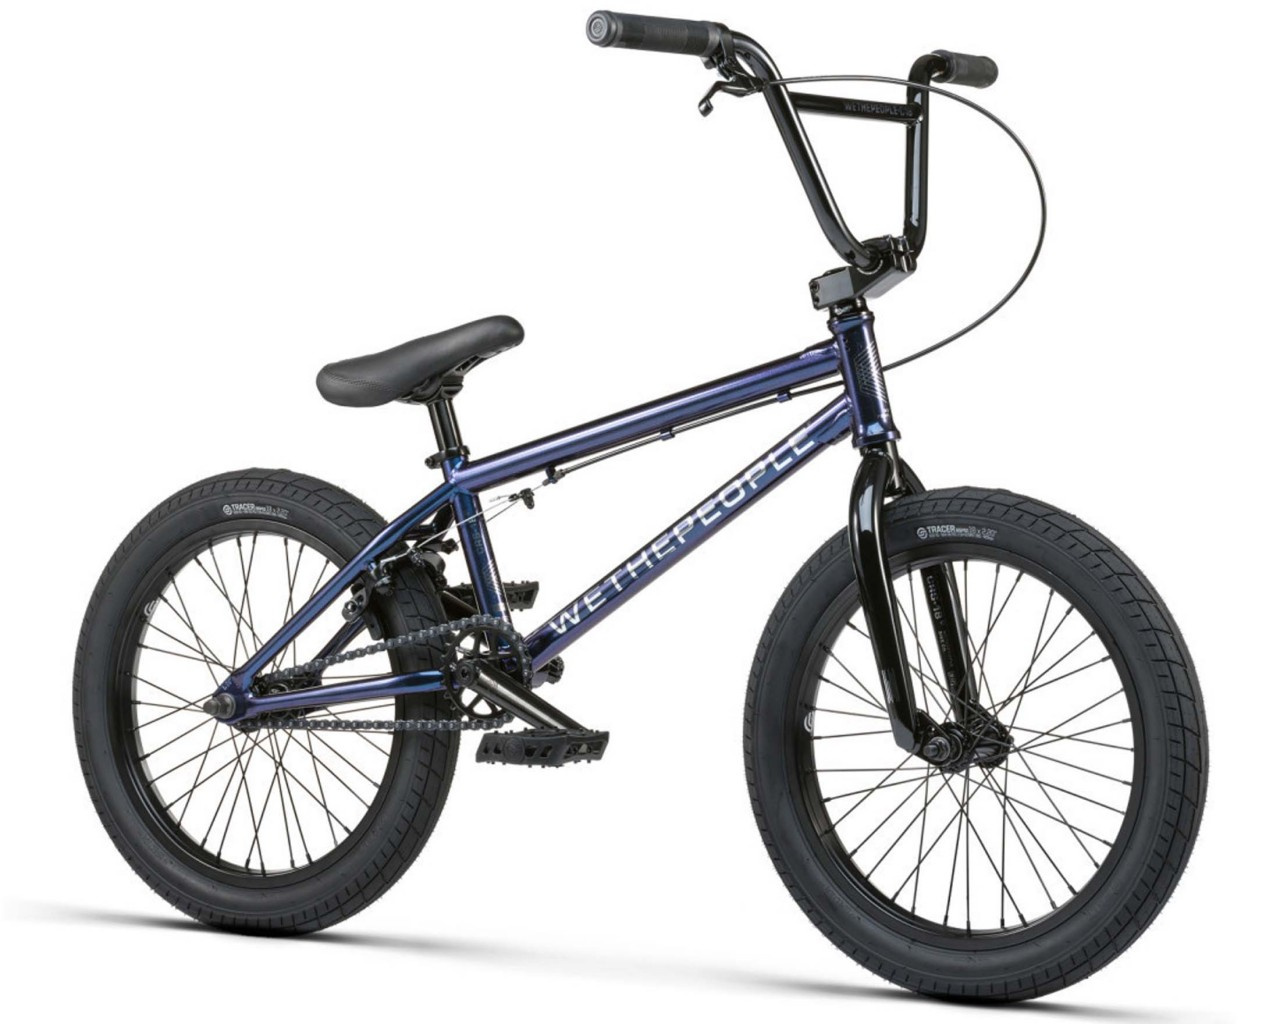 Wethepeople CRS 18 inch - BMX Bike   galactic purple